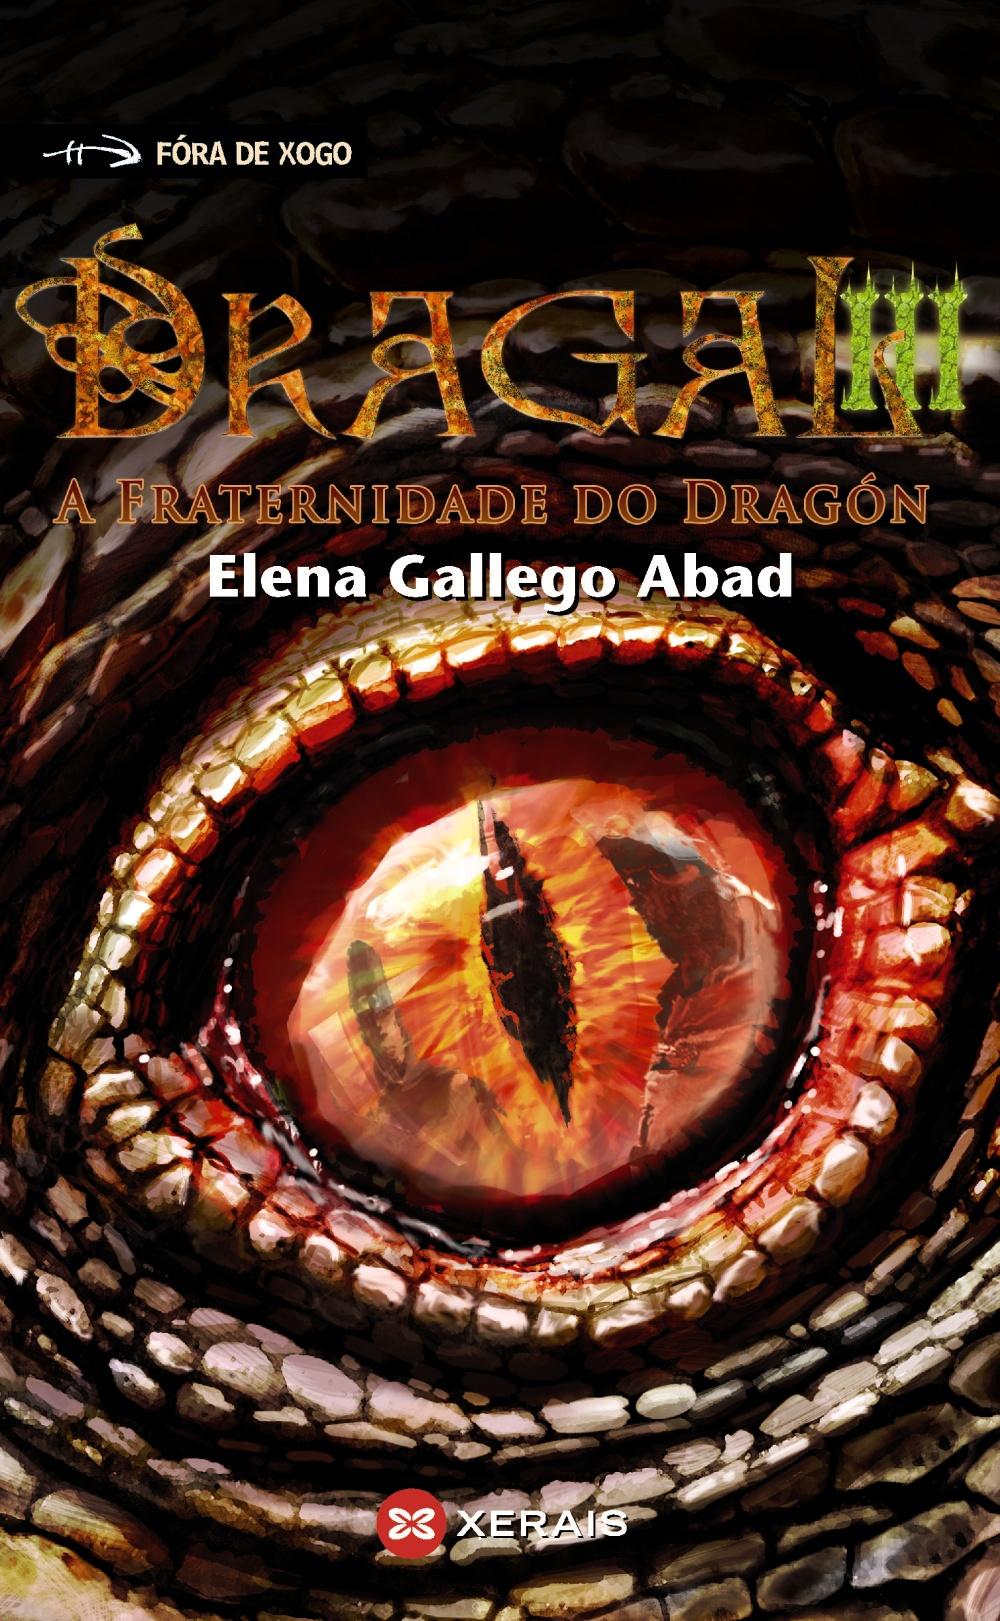 DRAGAL III. A FRATERNIDADE DO DRAGON